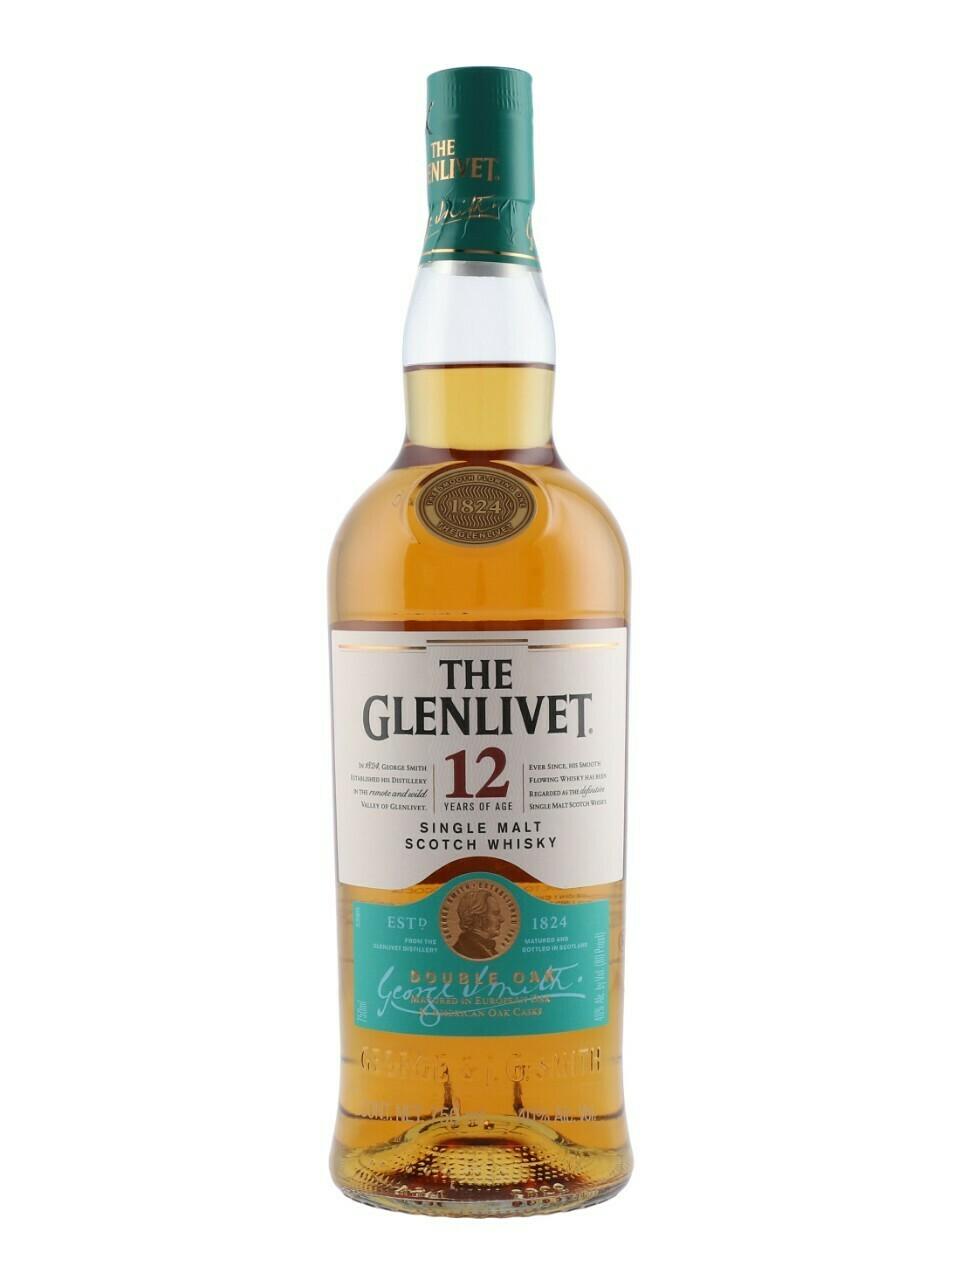 The Glenlivet 12 Year Old Single Malt Scotch Whisky